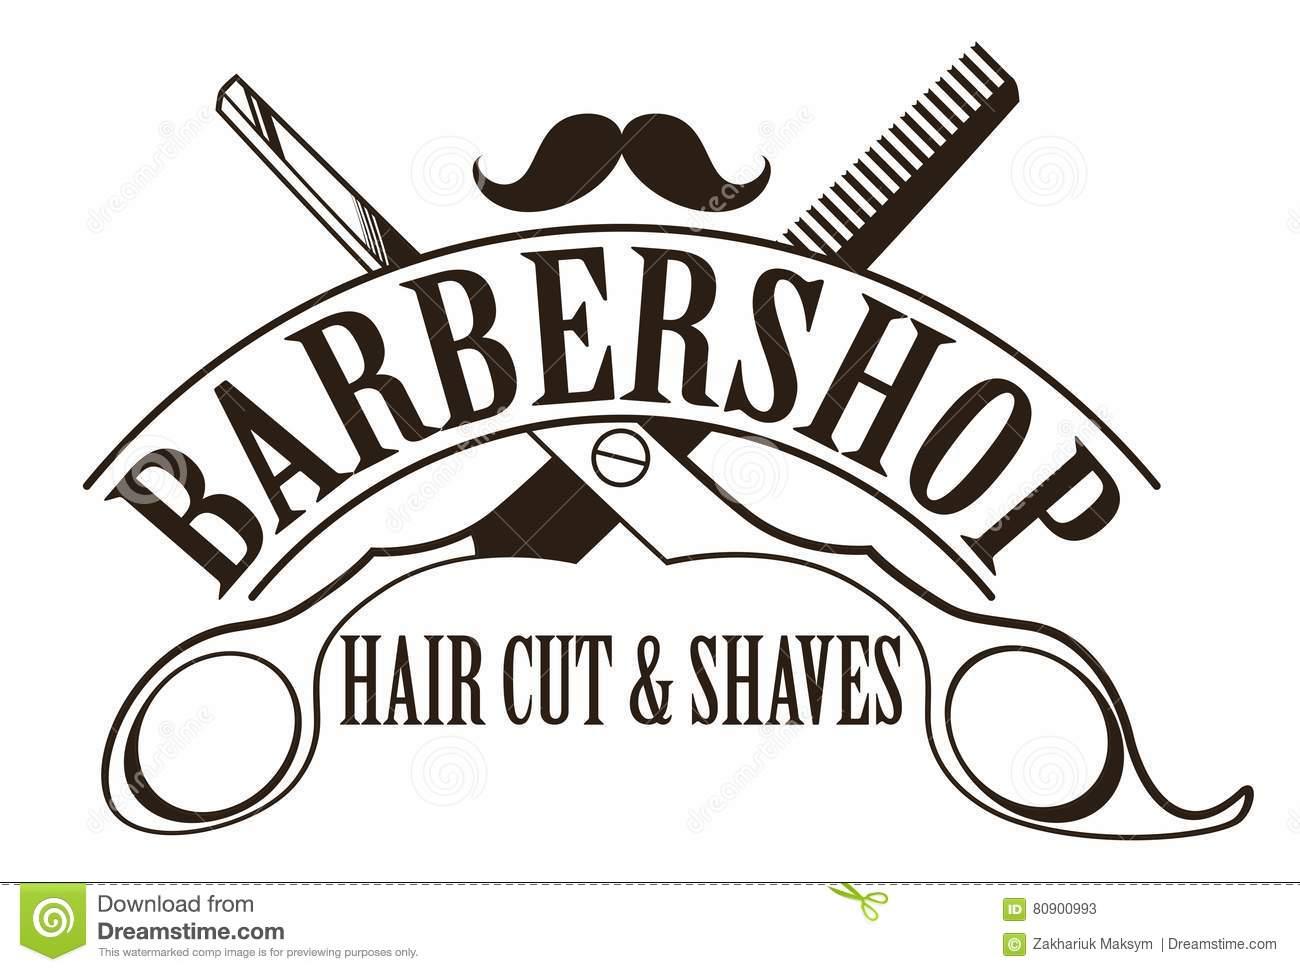 Barbershop logo stock vector. Illustration of business.